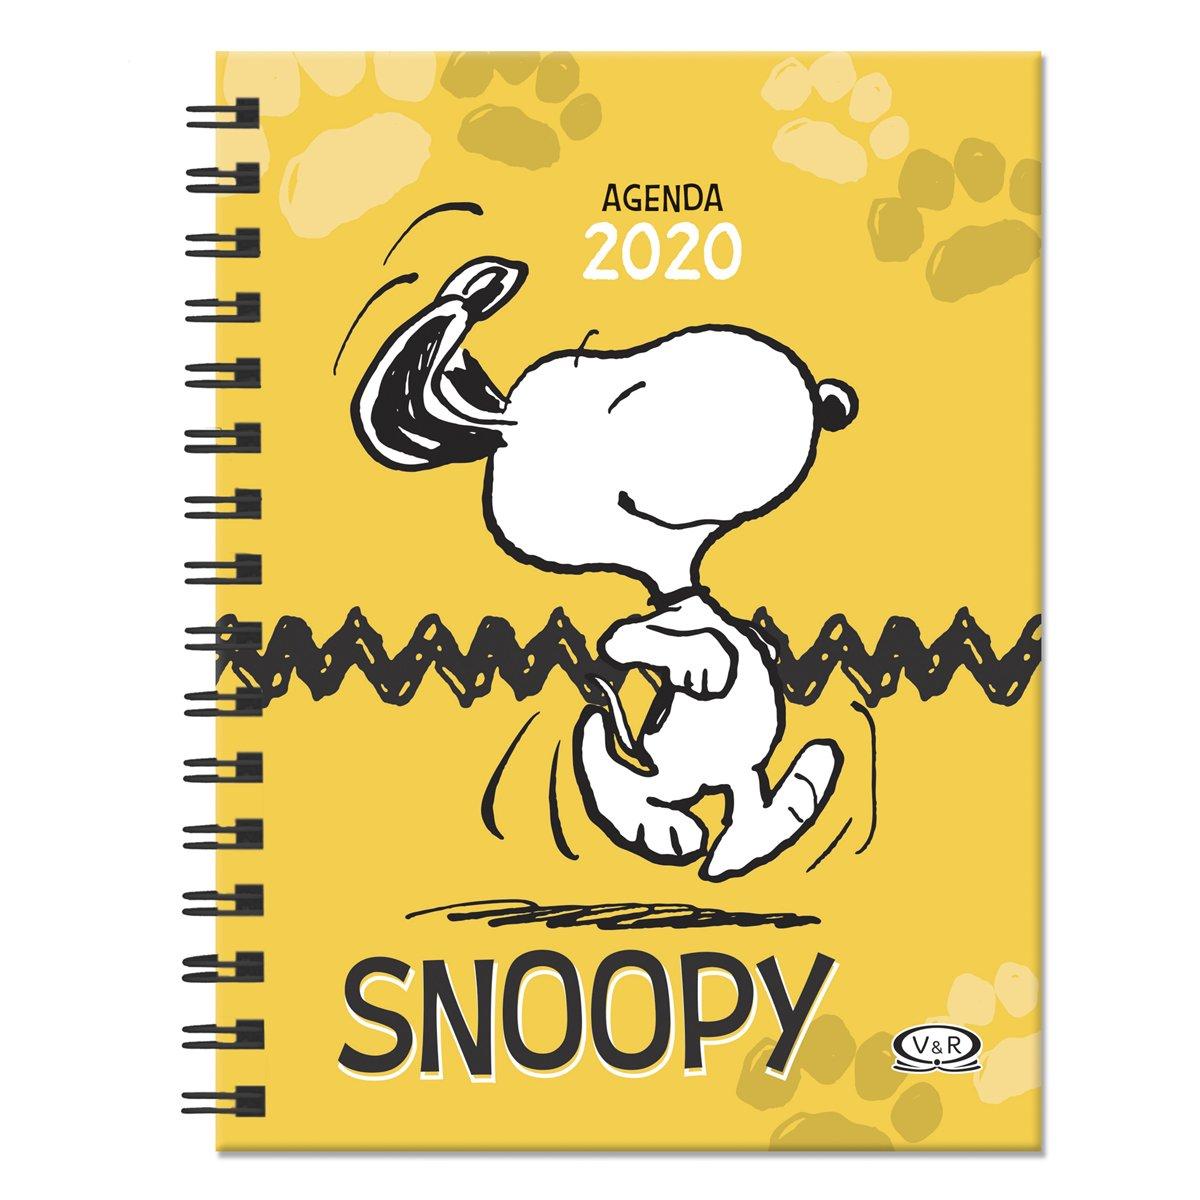 Snoopy Agenda 2020 Vergara & Riba